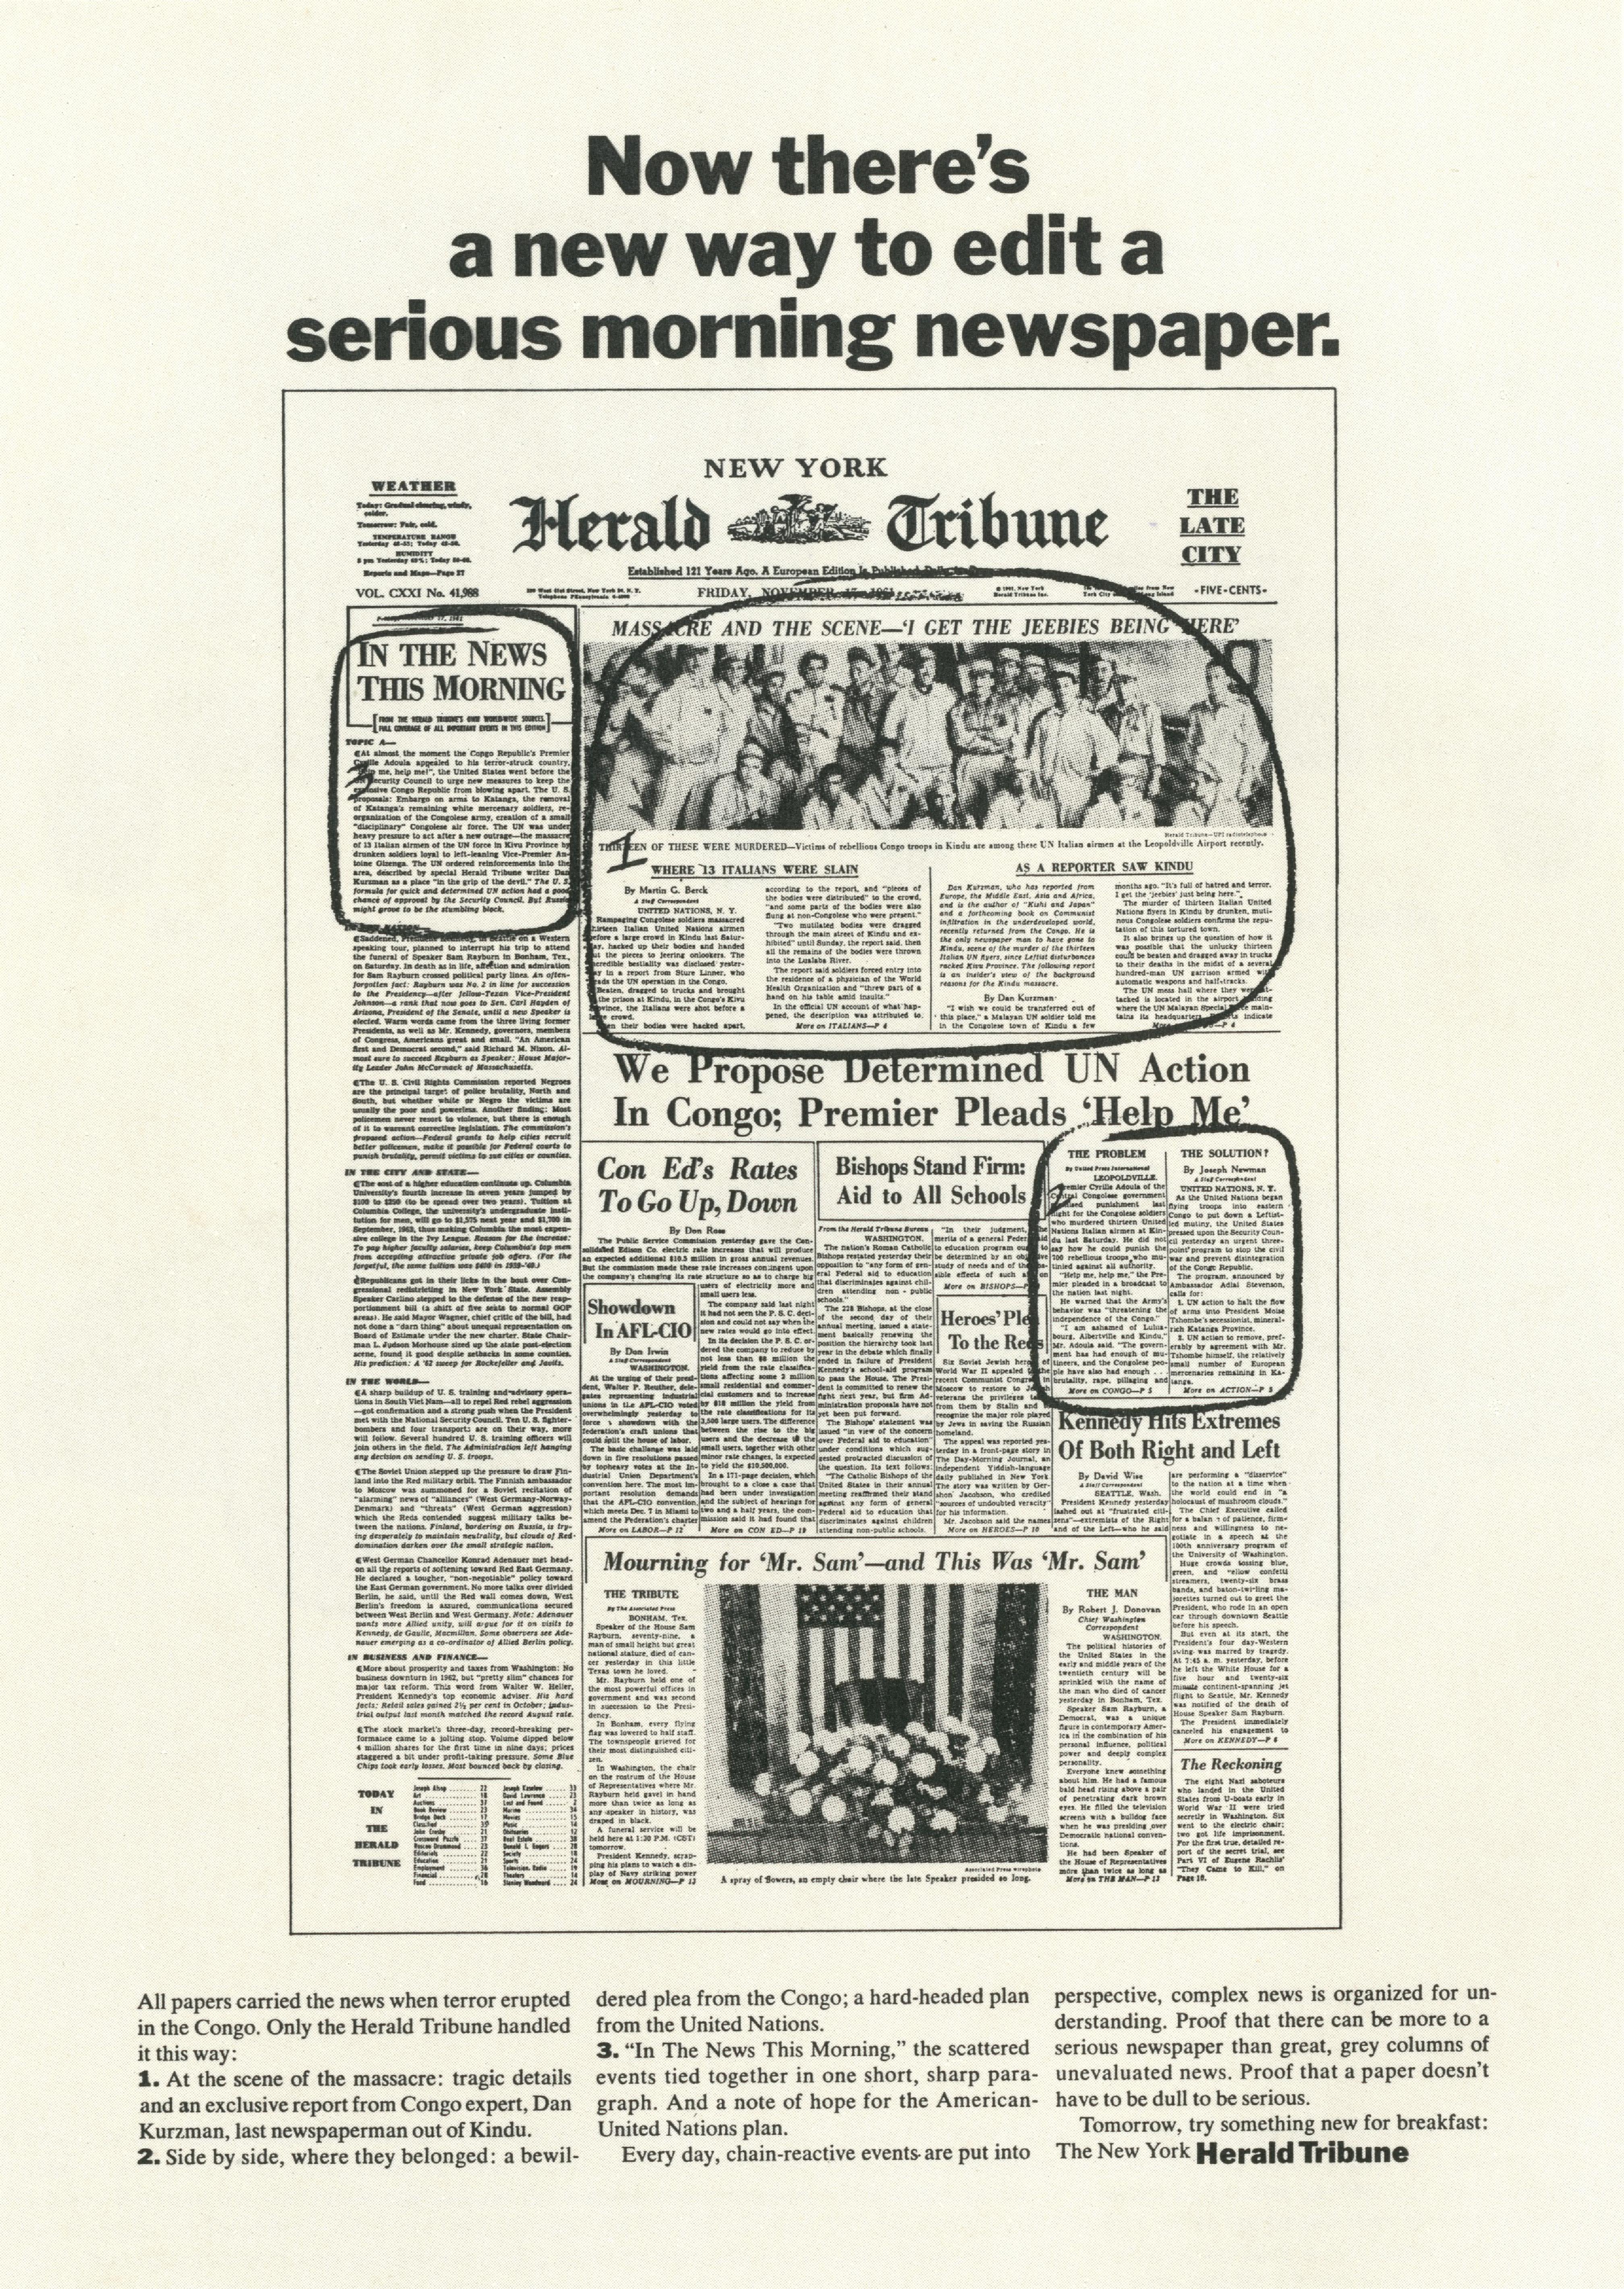 PKL2; Herald Tribune 'Edit'-01